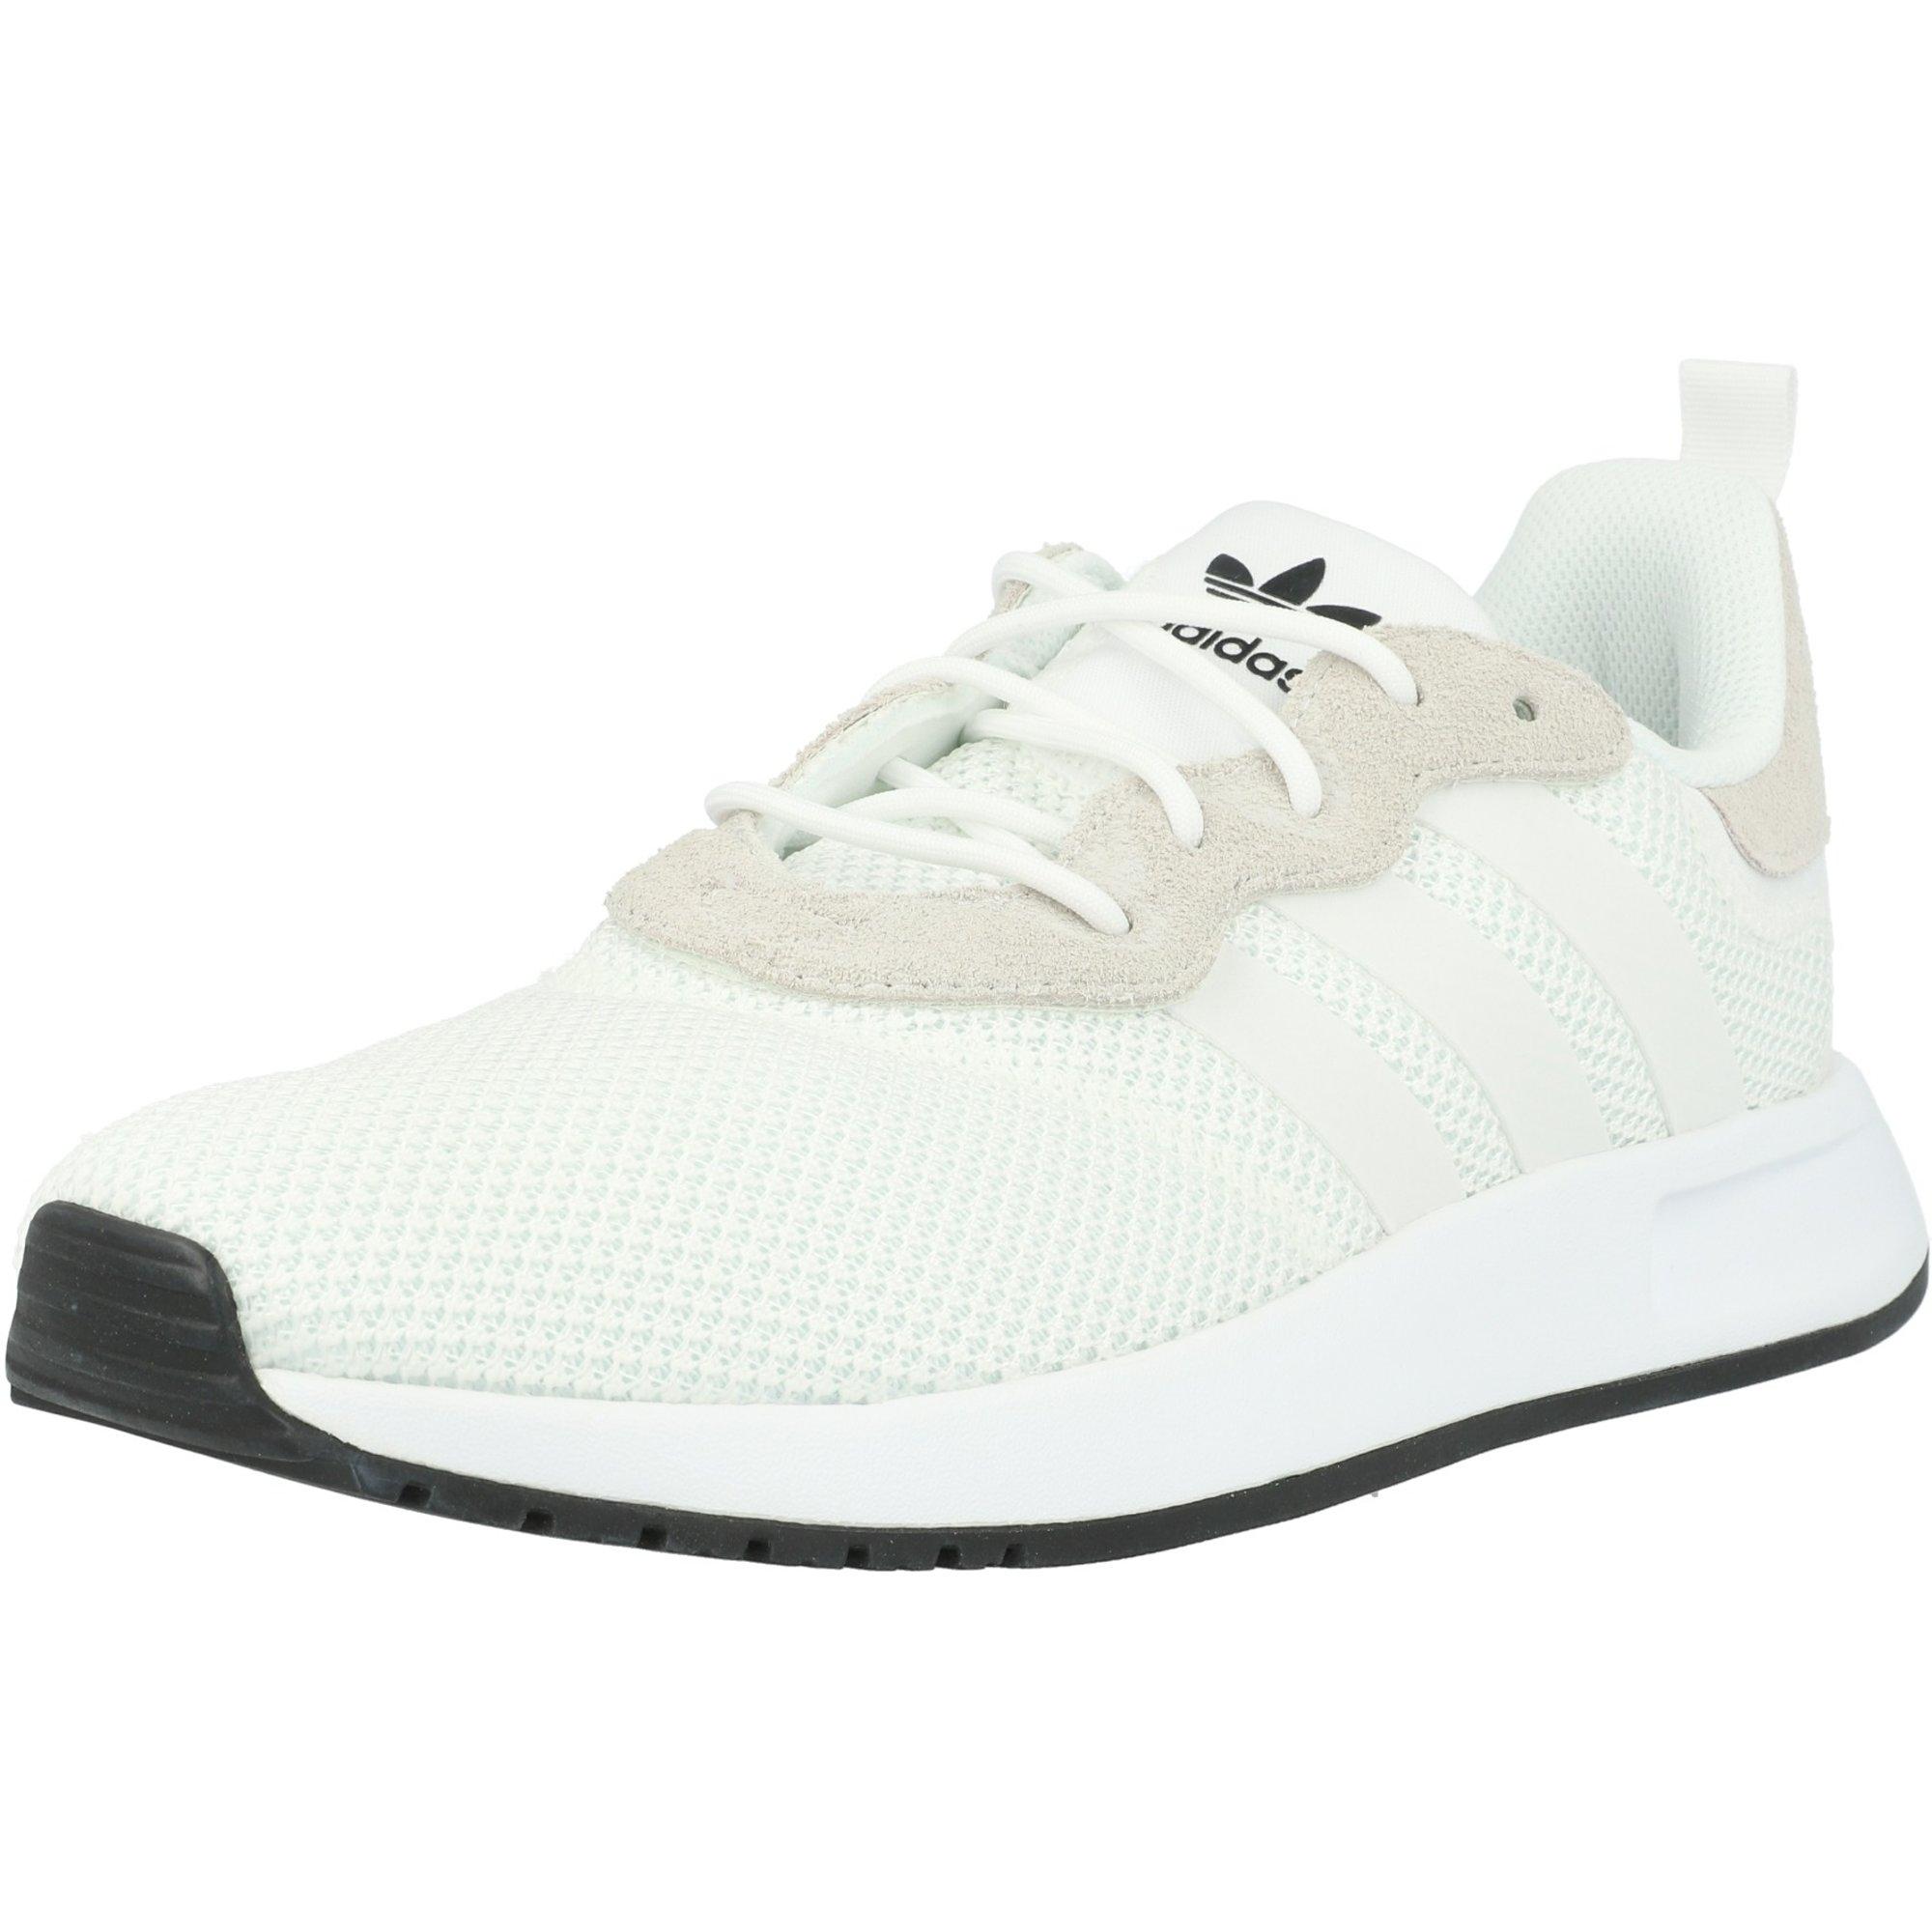 Emociónate O cualquiera cayó  adidas Originals X_PLR S White Mesh - Trainers Shoes - Awesome Shoes